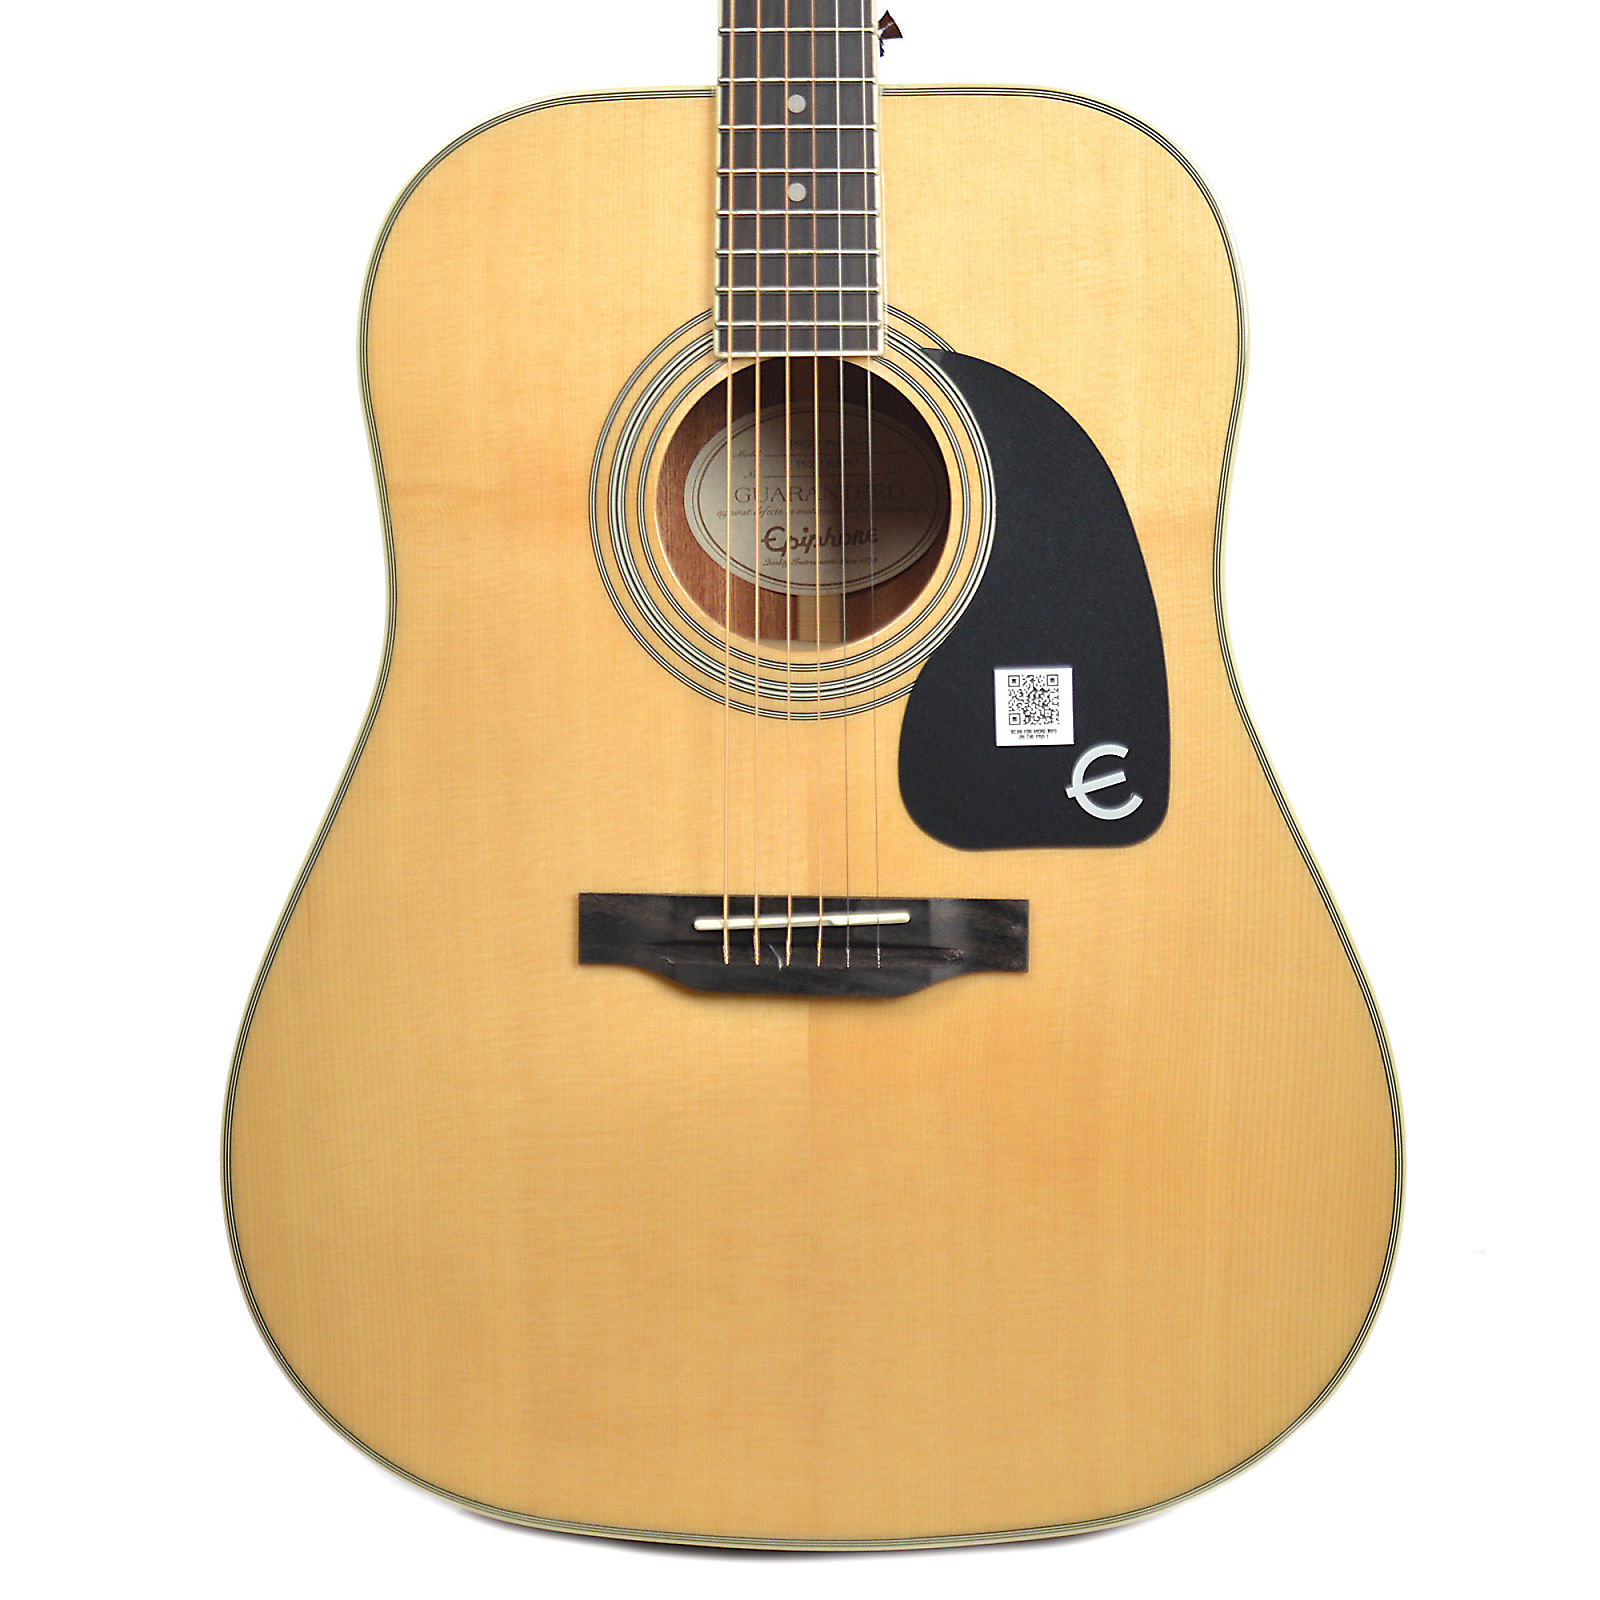 epiphone pro 1 plus dreadnought acoustic guitar natural reverb. Black Bedroom Furniture Sets. Home Design Ideas